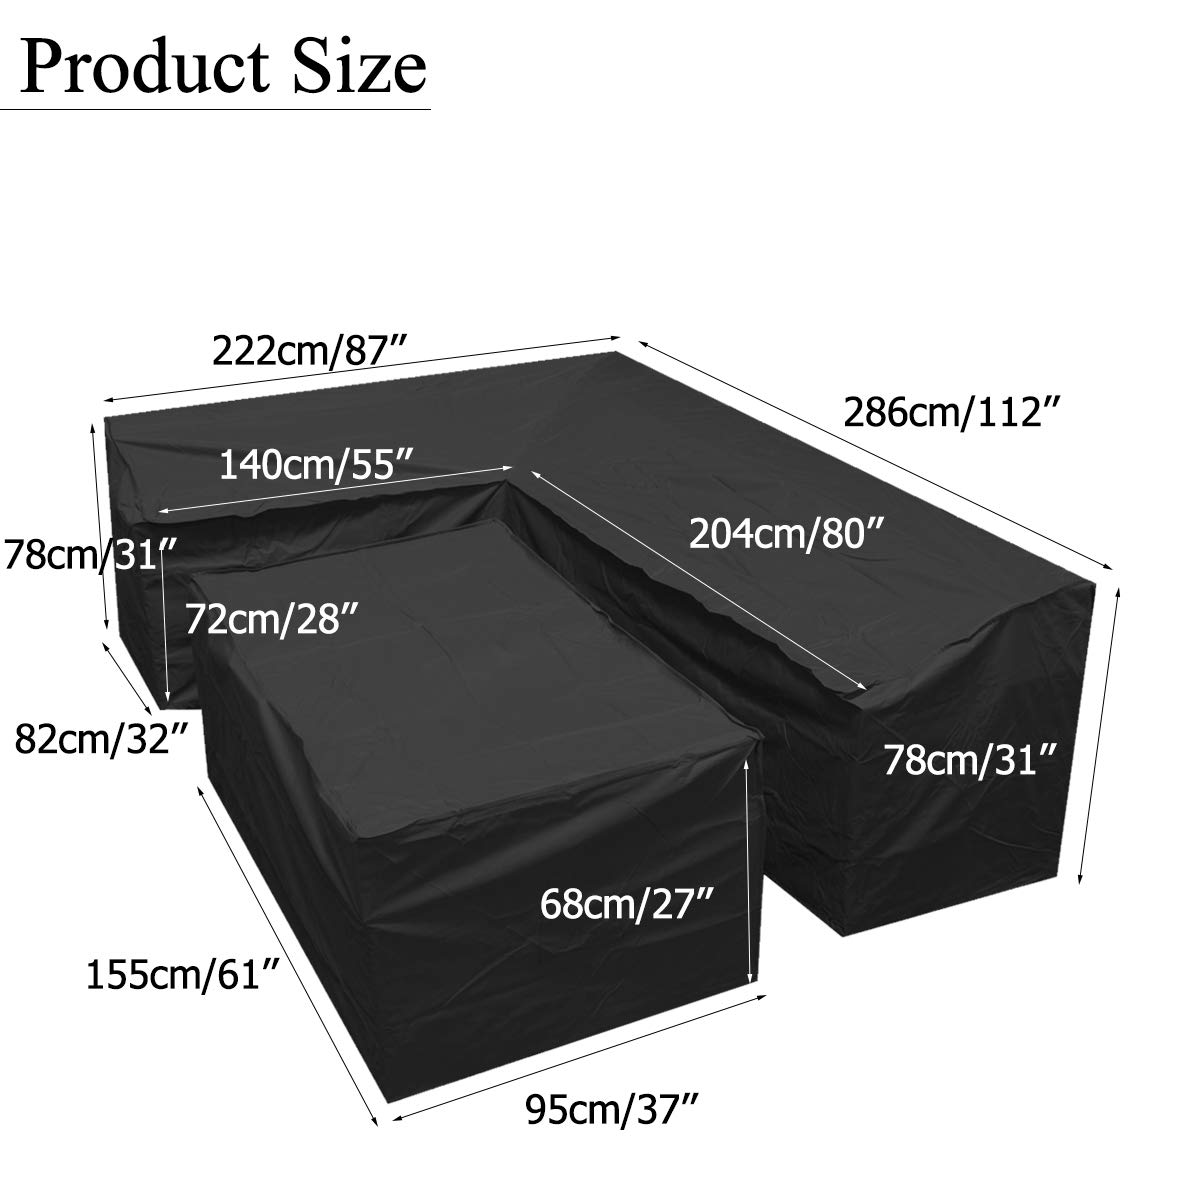 Möbelschutzhüllen L-Form Gartenmöbel Ecksofa Schutzhülle Abdeckung Wasserdicht